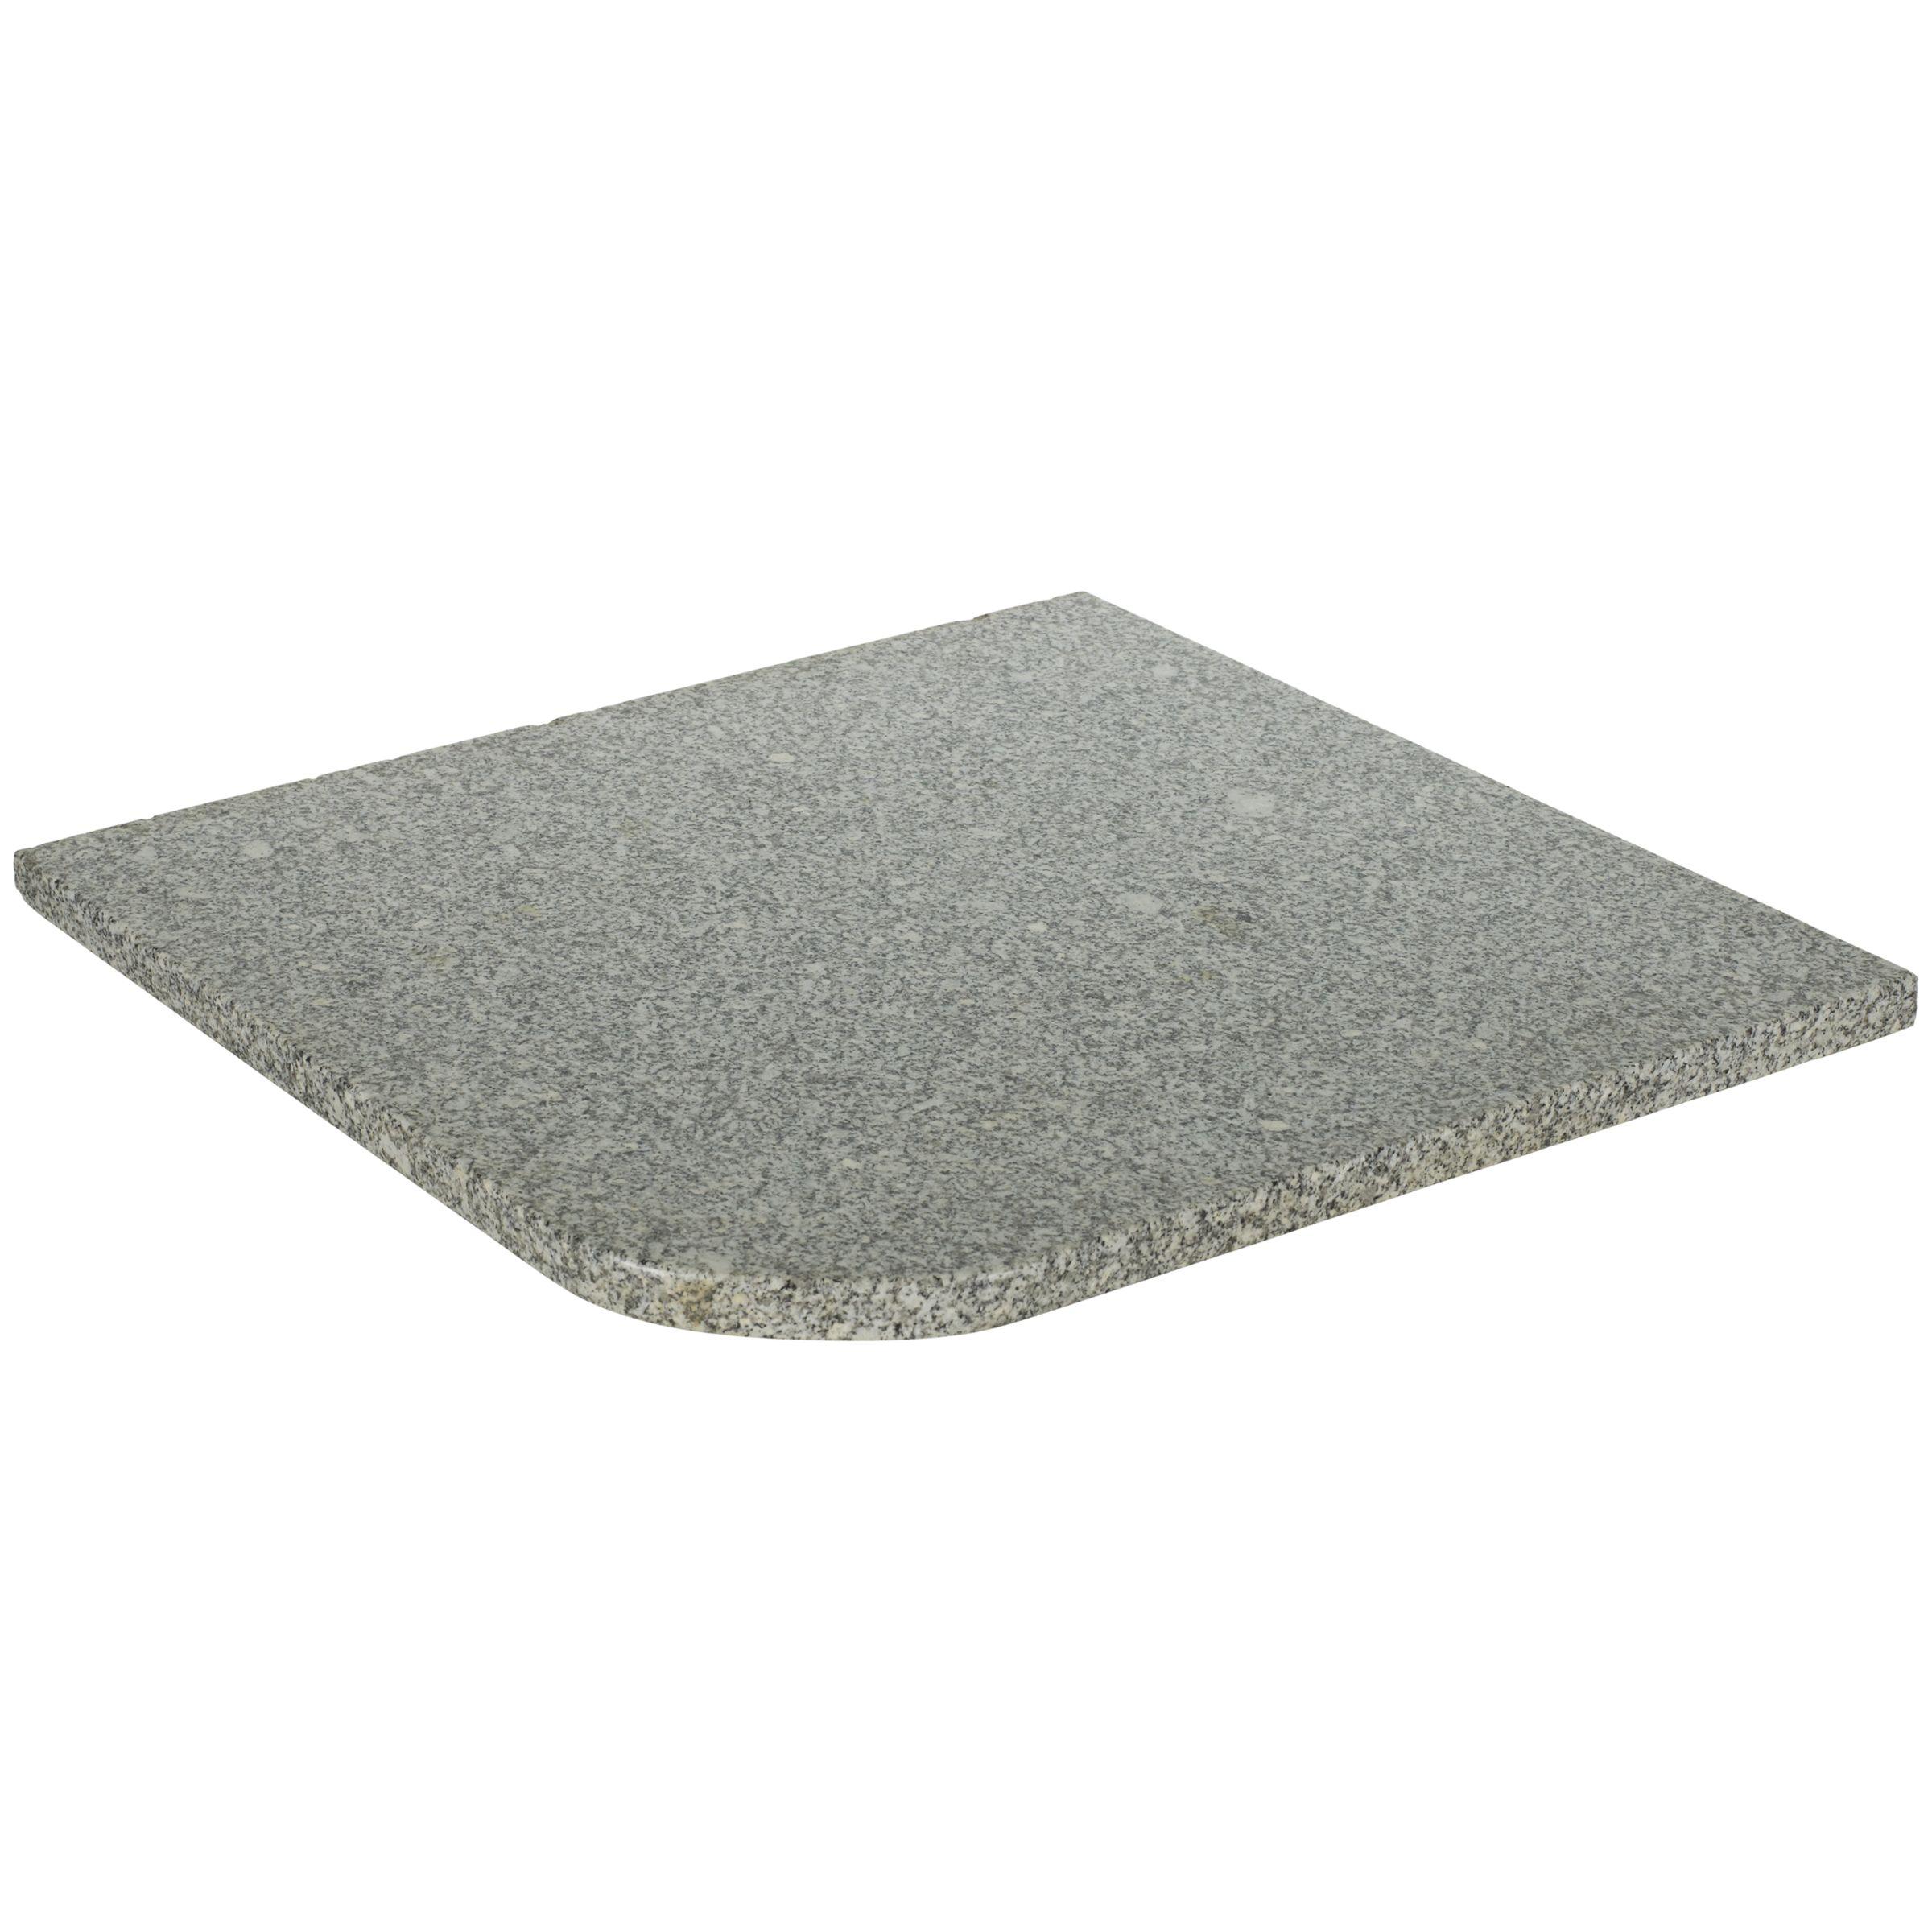 John Lewis Freestanding Granite Slabs